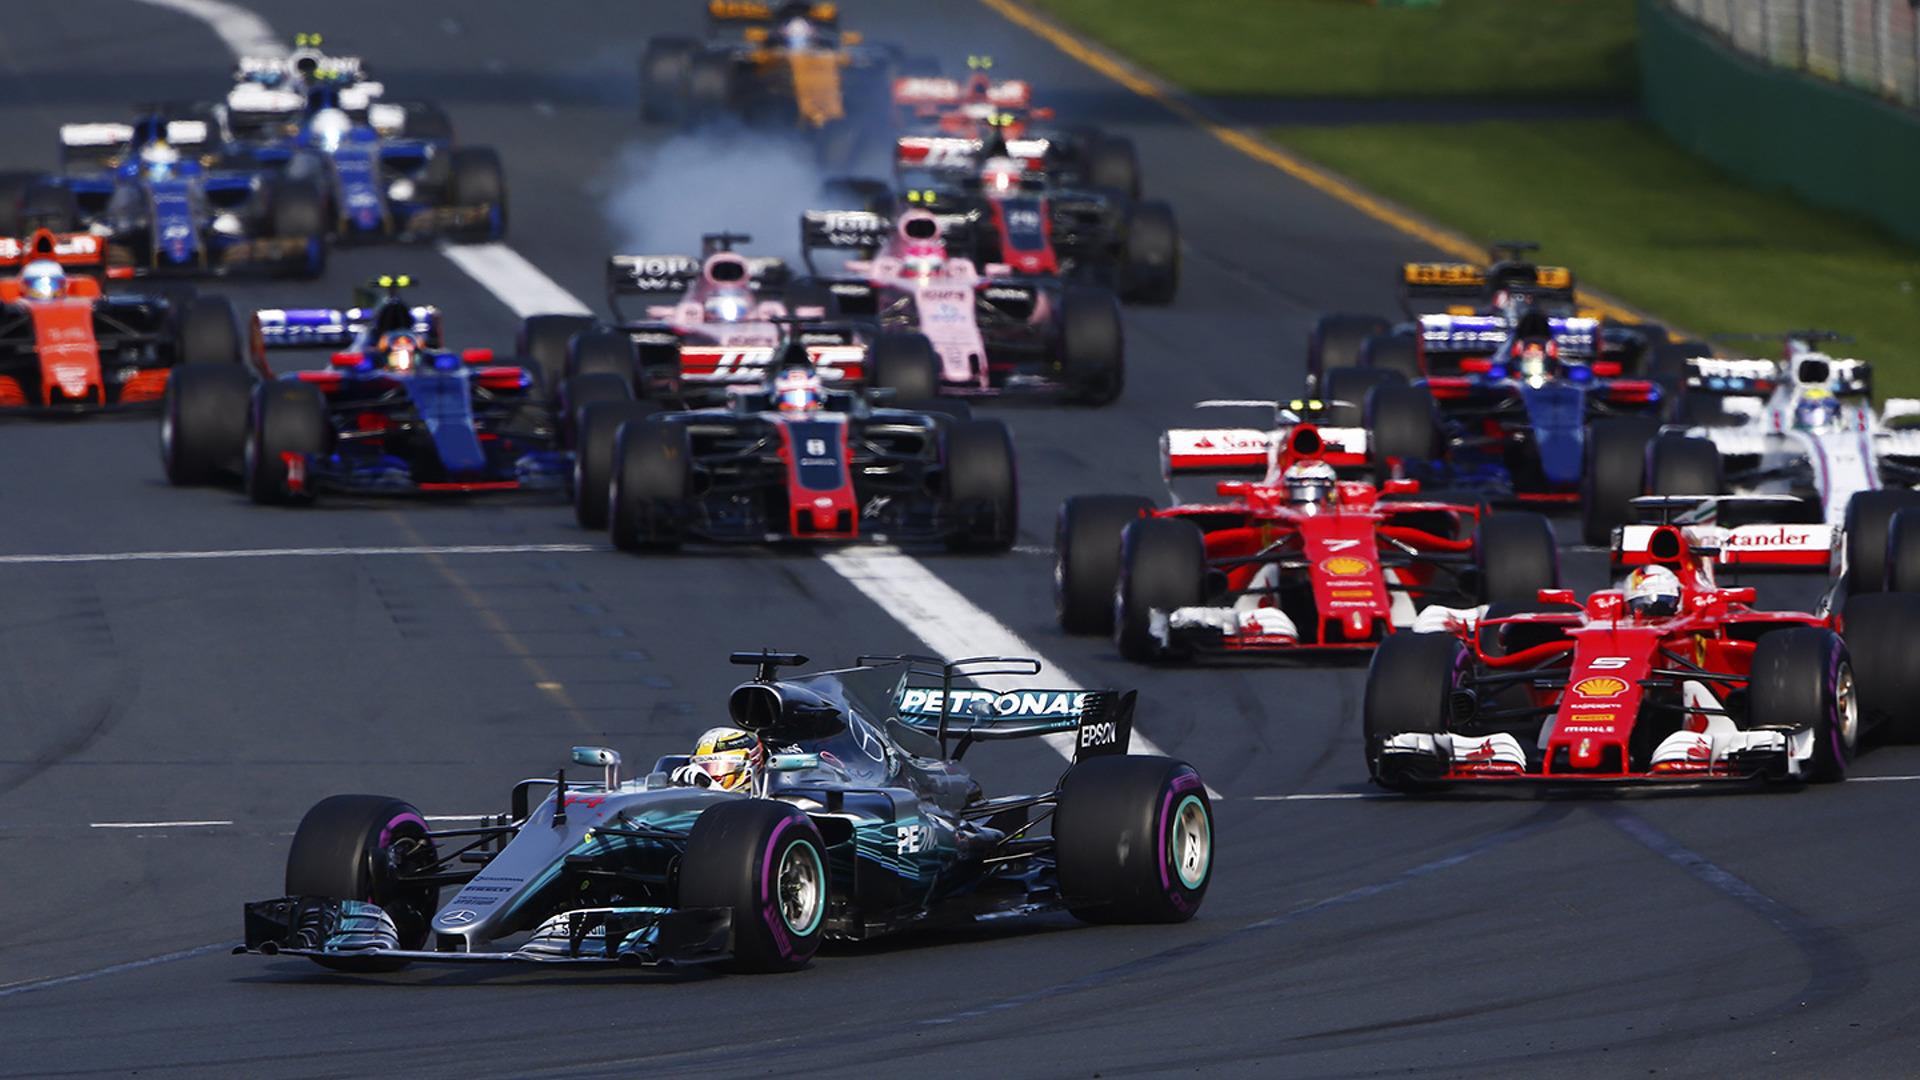 Photo of Formula 1 puanlama sisteminde flaş değişiklik!